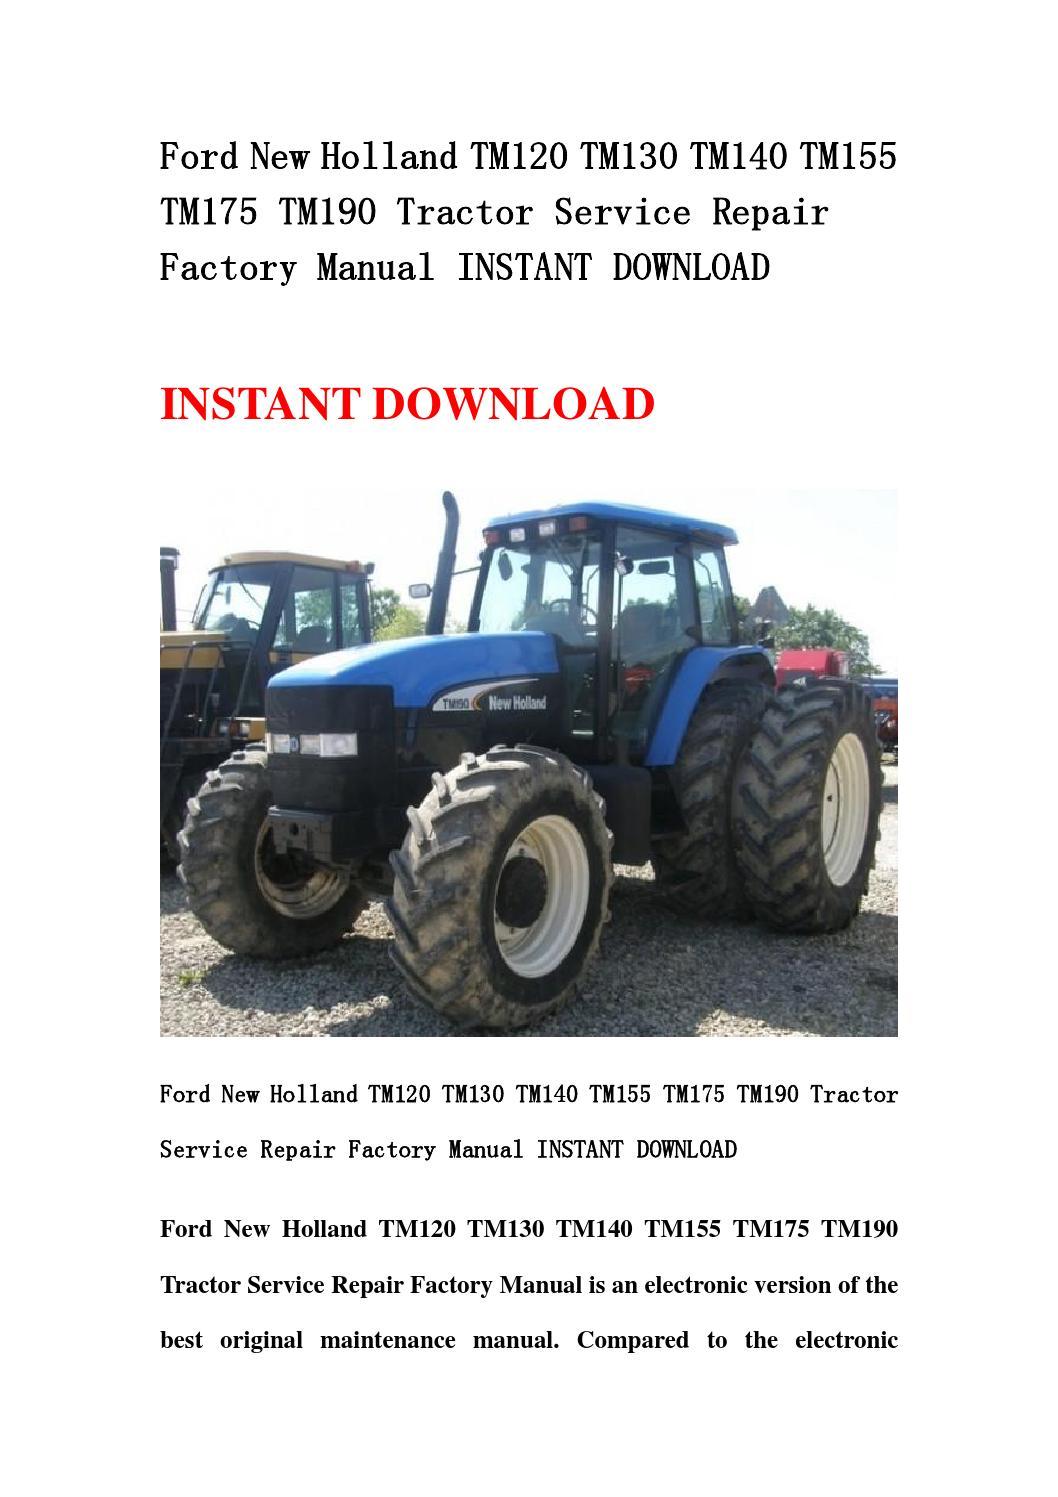 Ford new holland tm120 tm130 tm140 tm155 tm175 tm190 tractor service repair  factory manual instant d by kfmjsnef - issuu